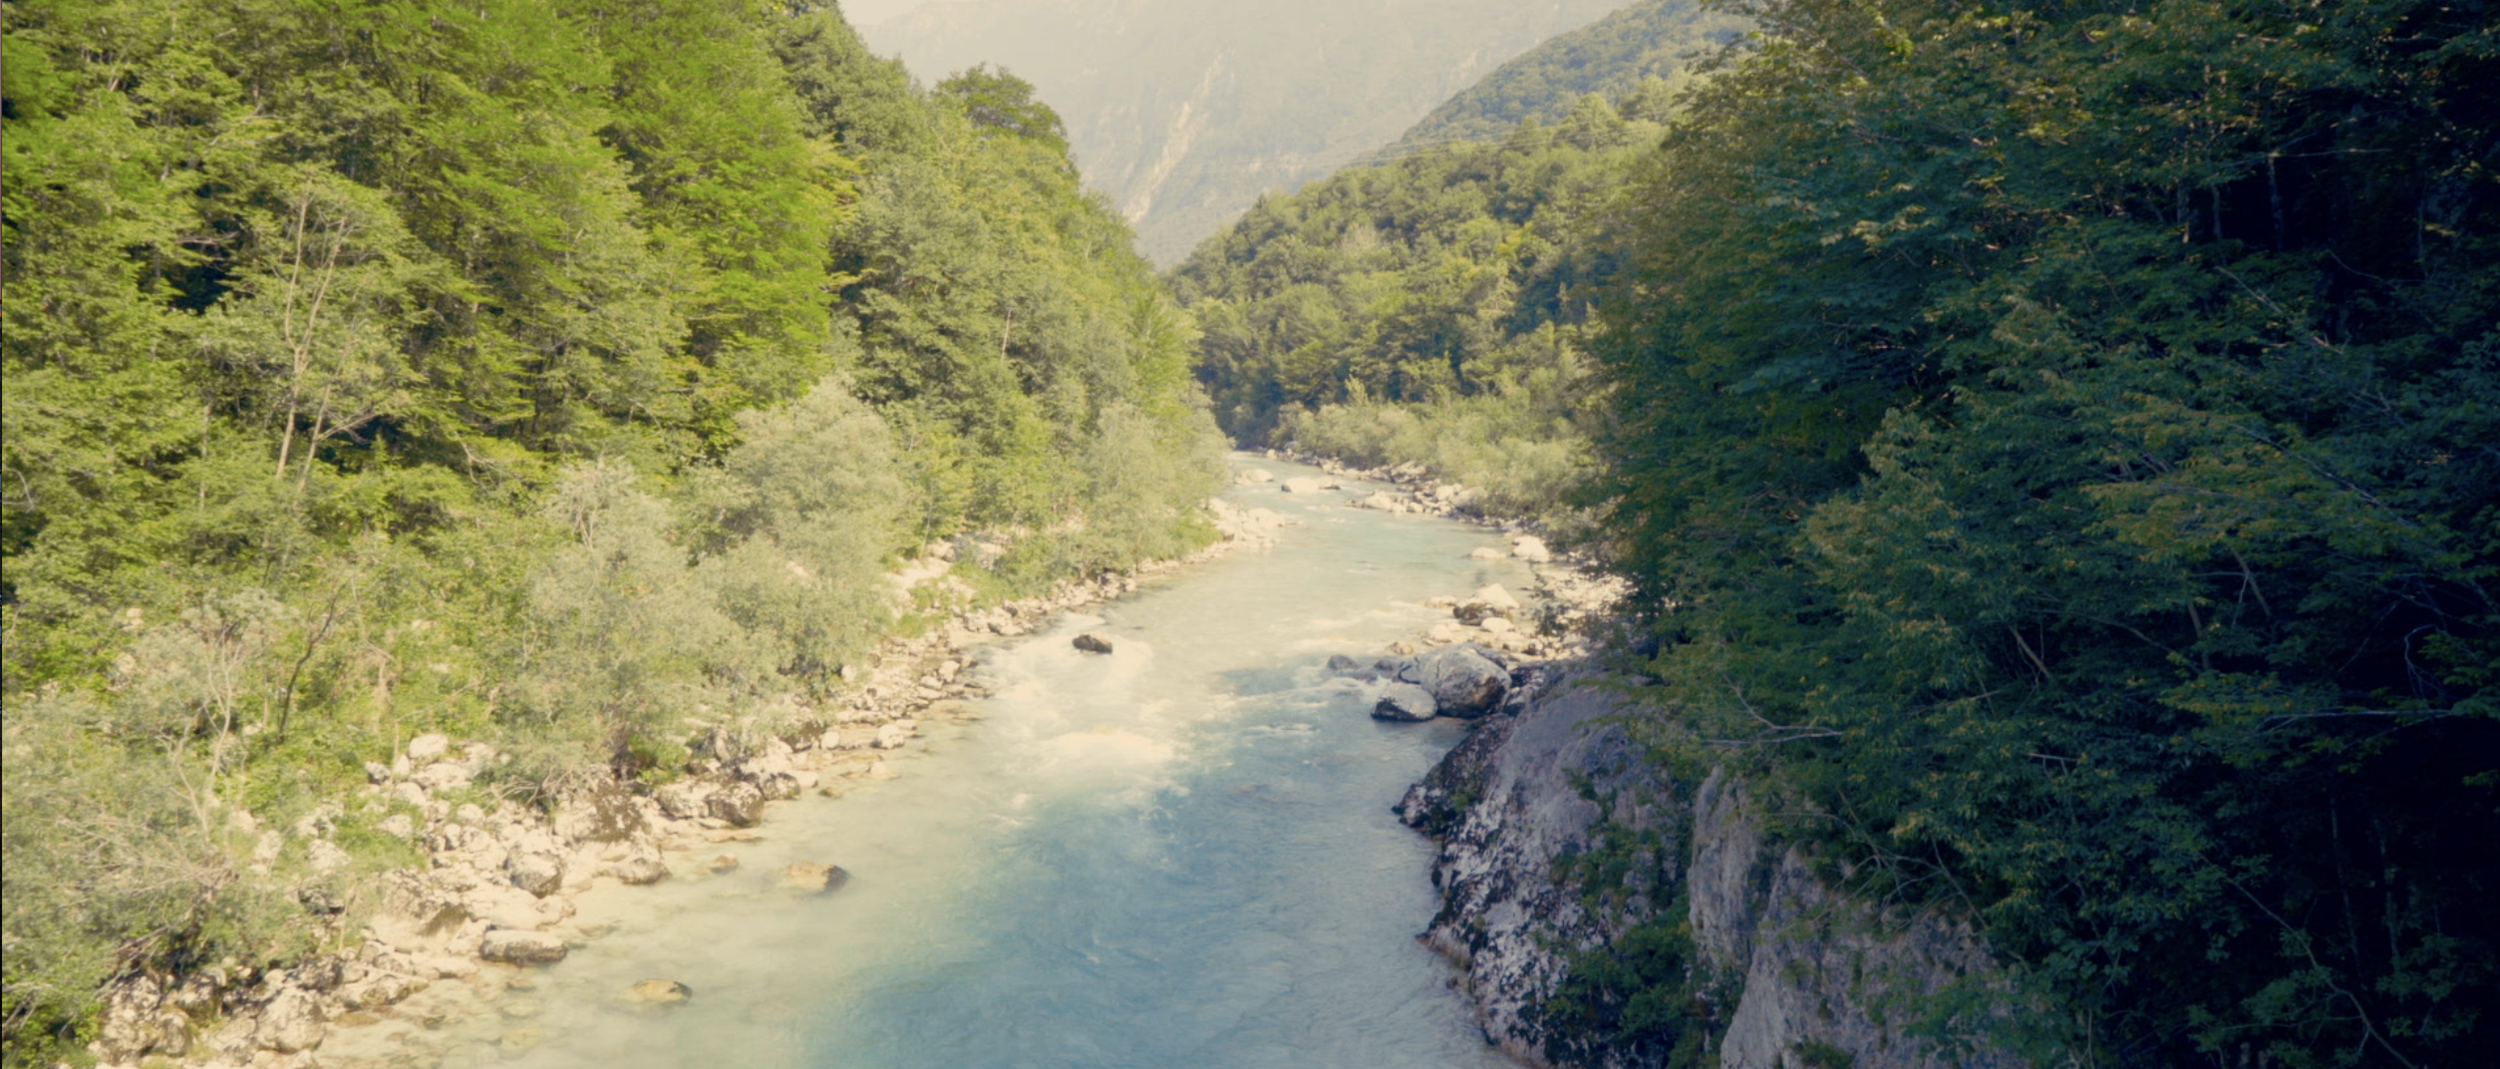 #TravelSlovenia Video